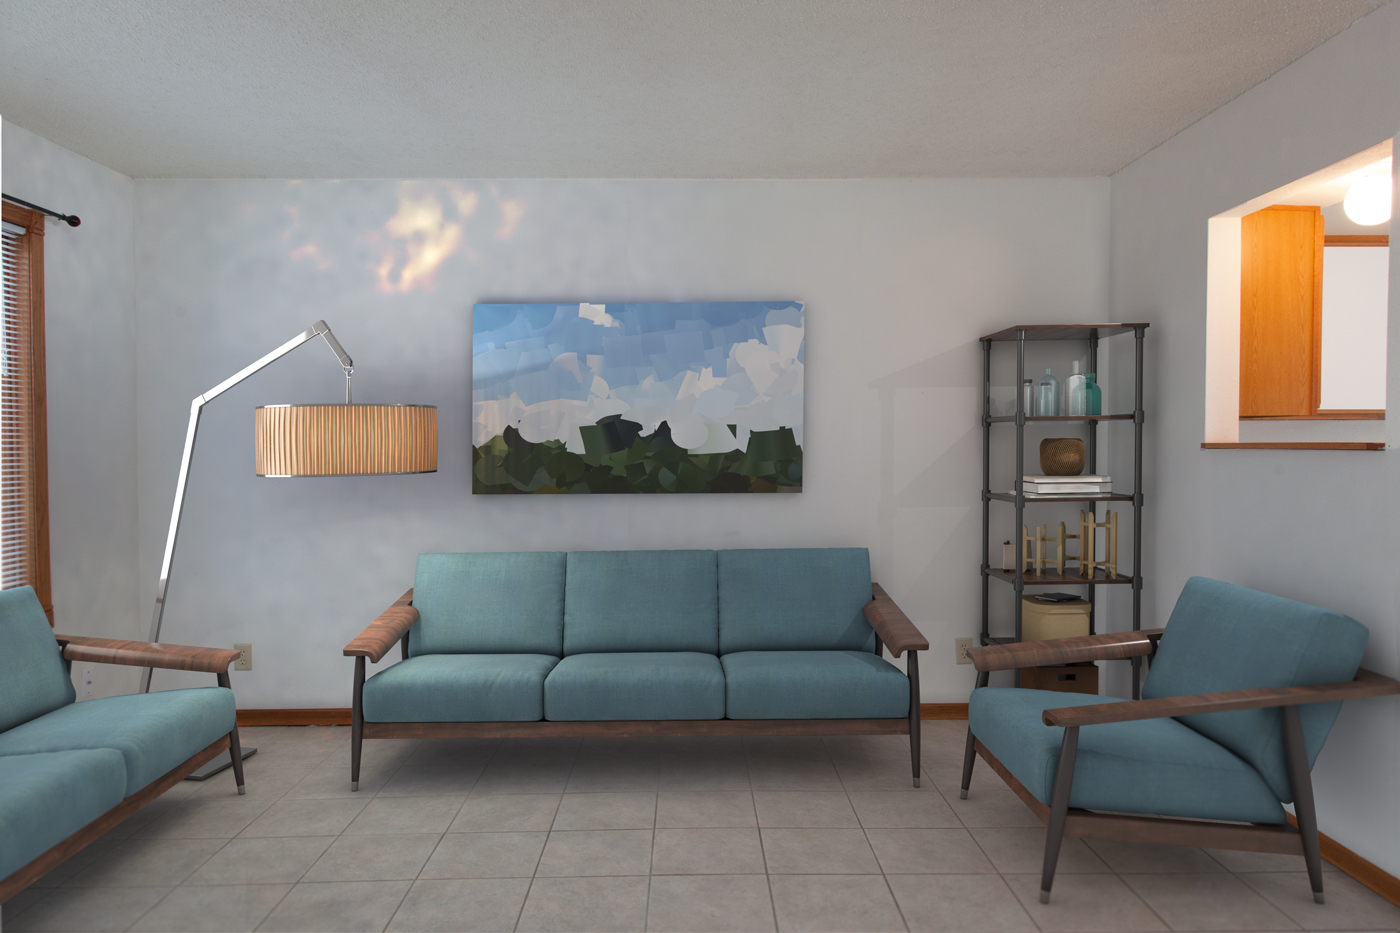 Living-Room-staged-scene-1-Borner-st